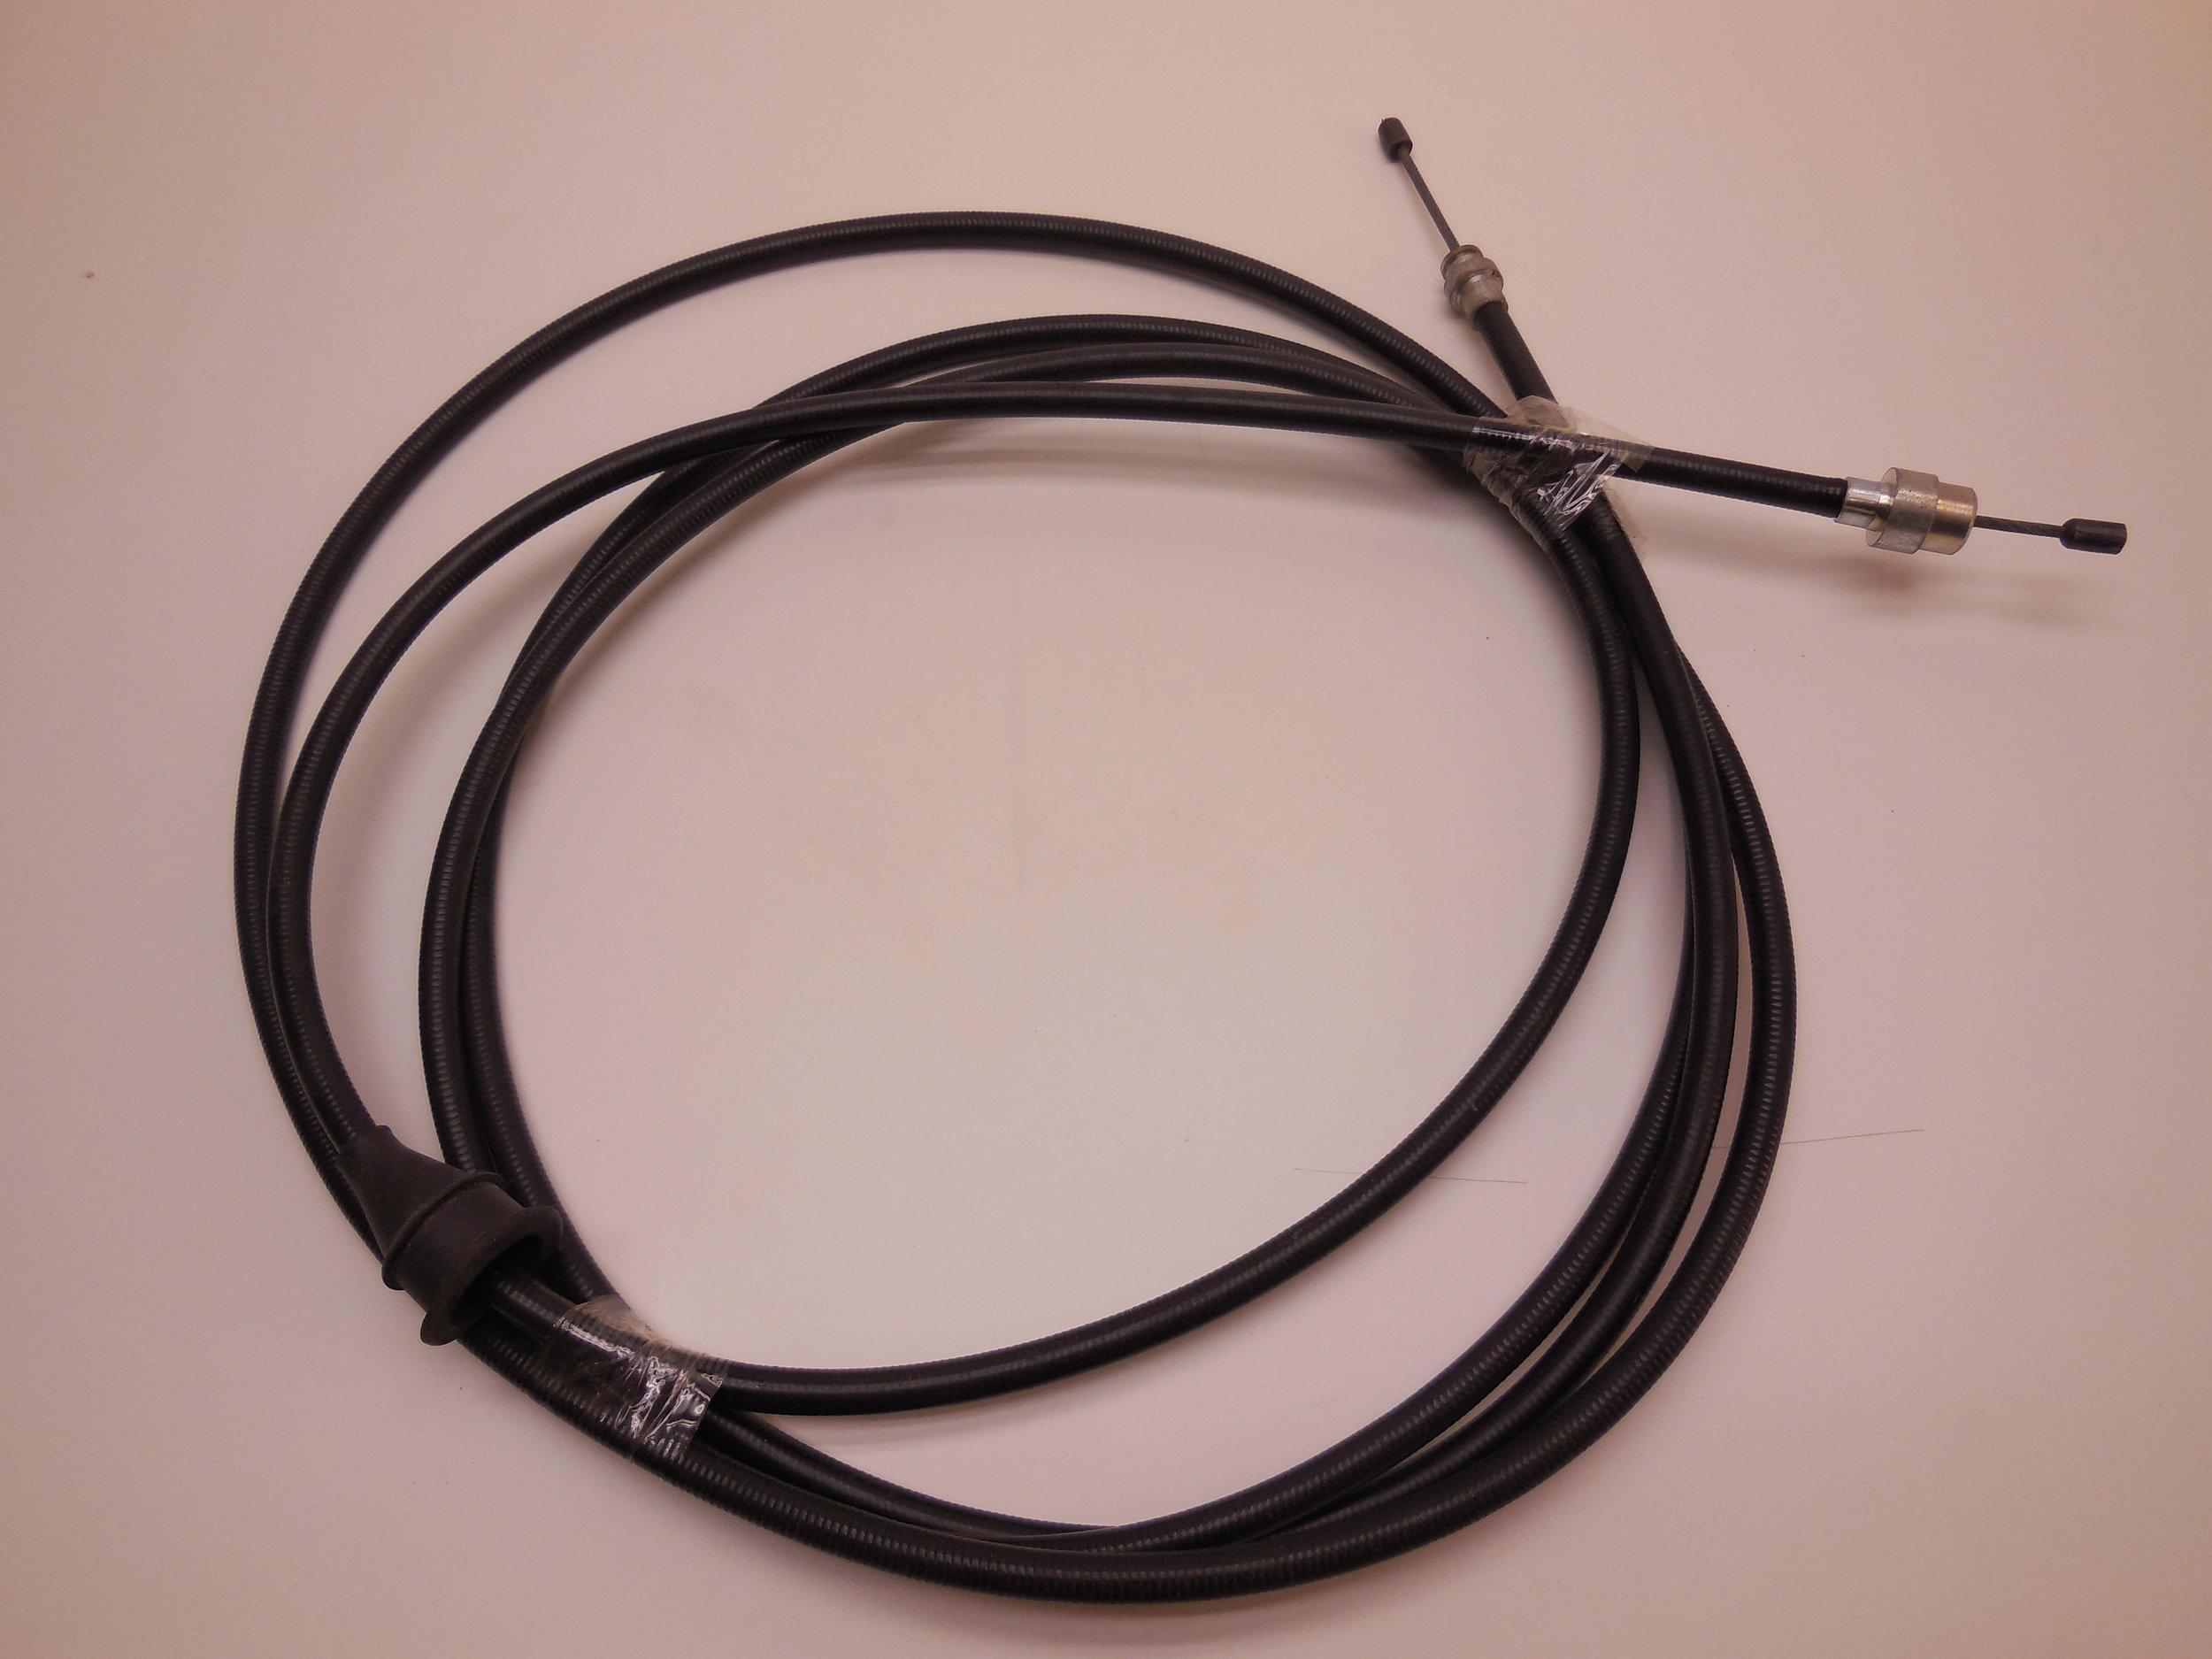 Parking break wire (Hardtop) häggo Nr: 353 6049-801 Price: 3900 SEK